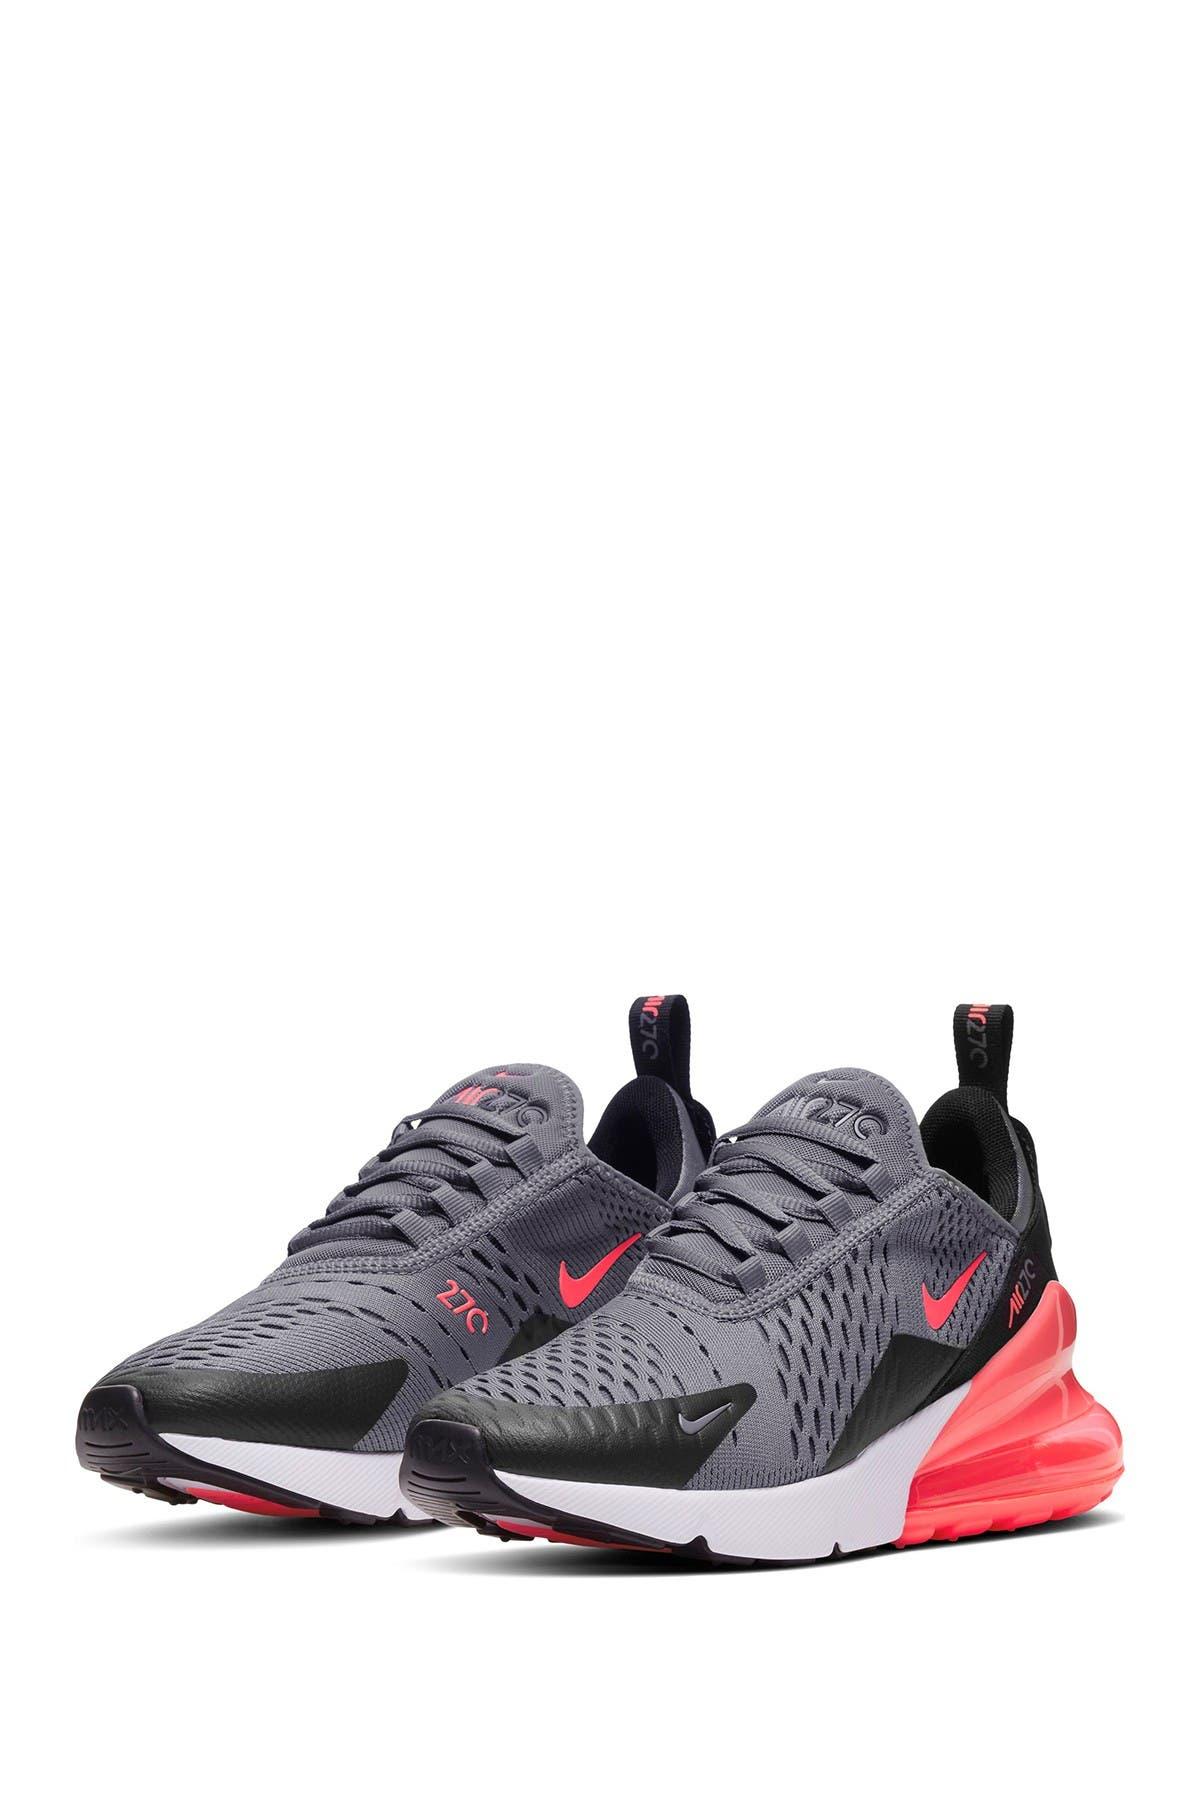 Nike | Air Max 270 GS | Nordstrom Rack